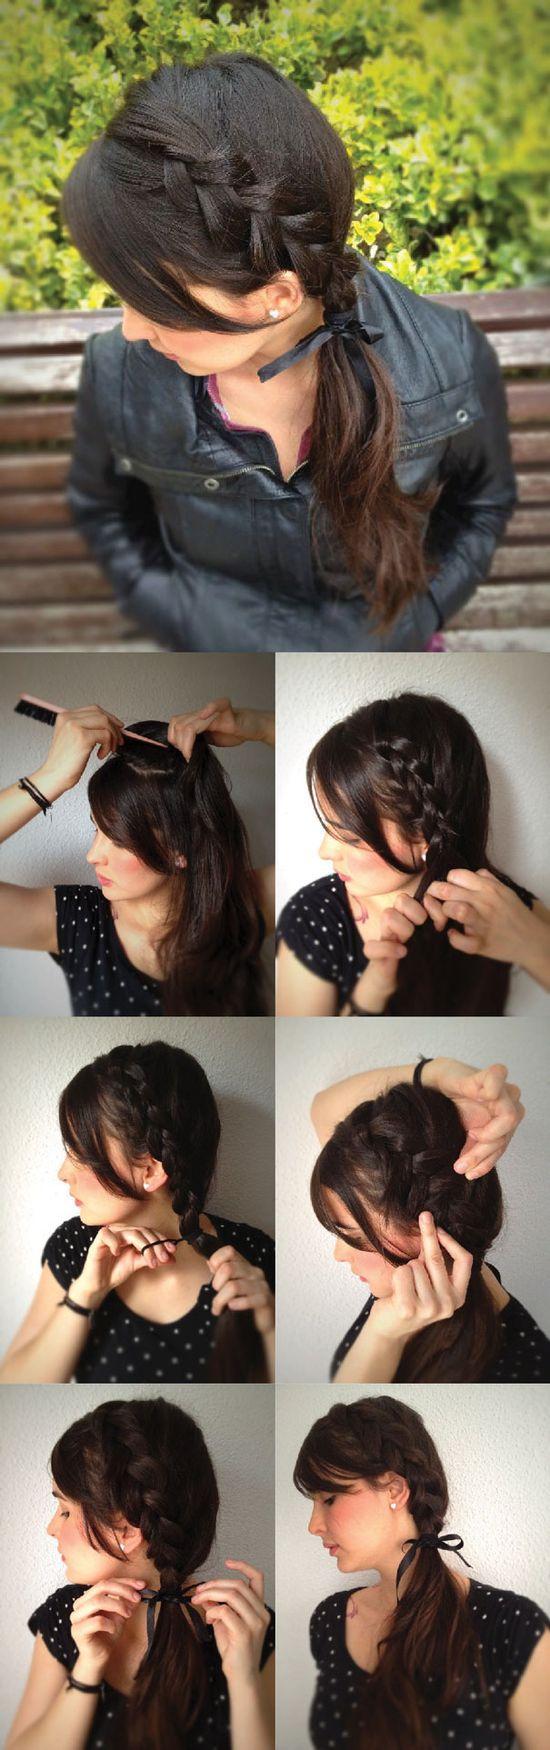 hairstyles, hairstyles, hairstyles